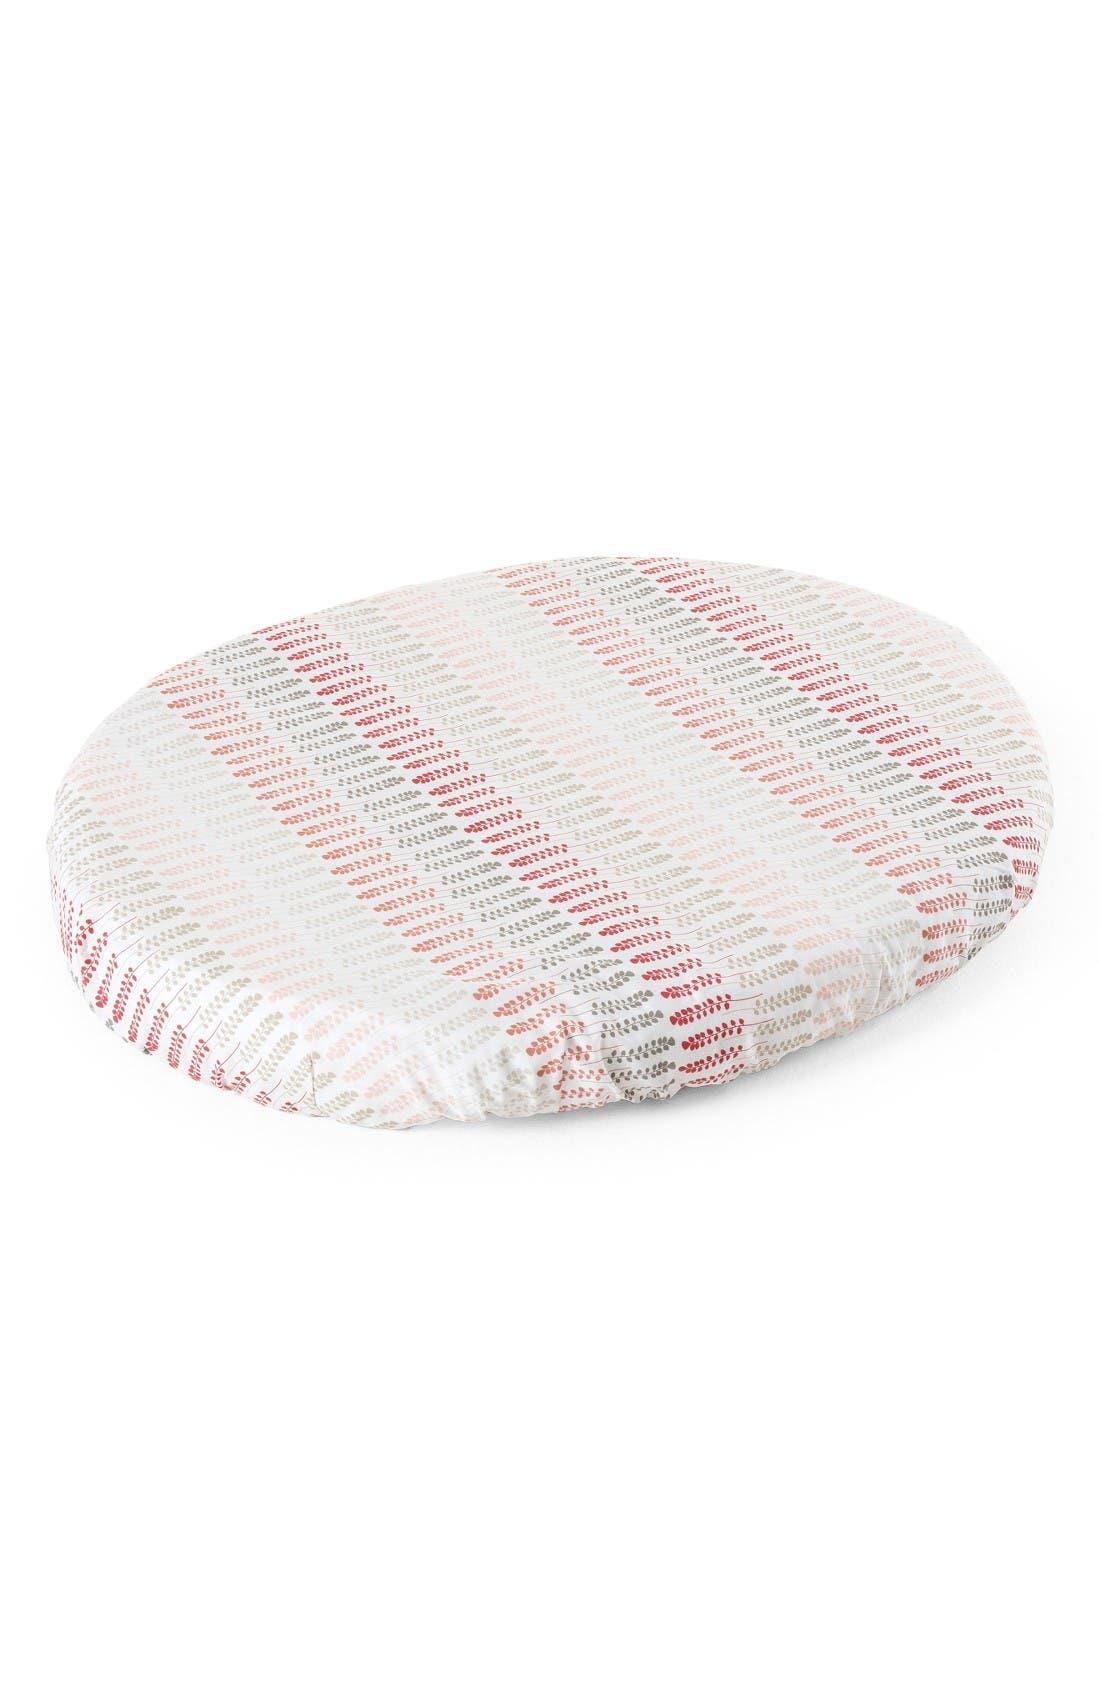 Main Image - Stokke Sleepi Mini Fitted Crib Sheet